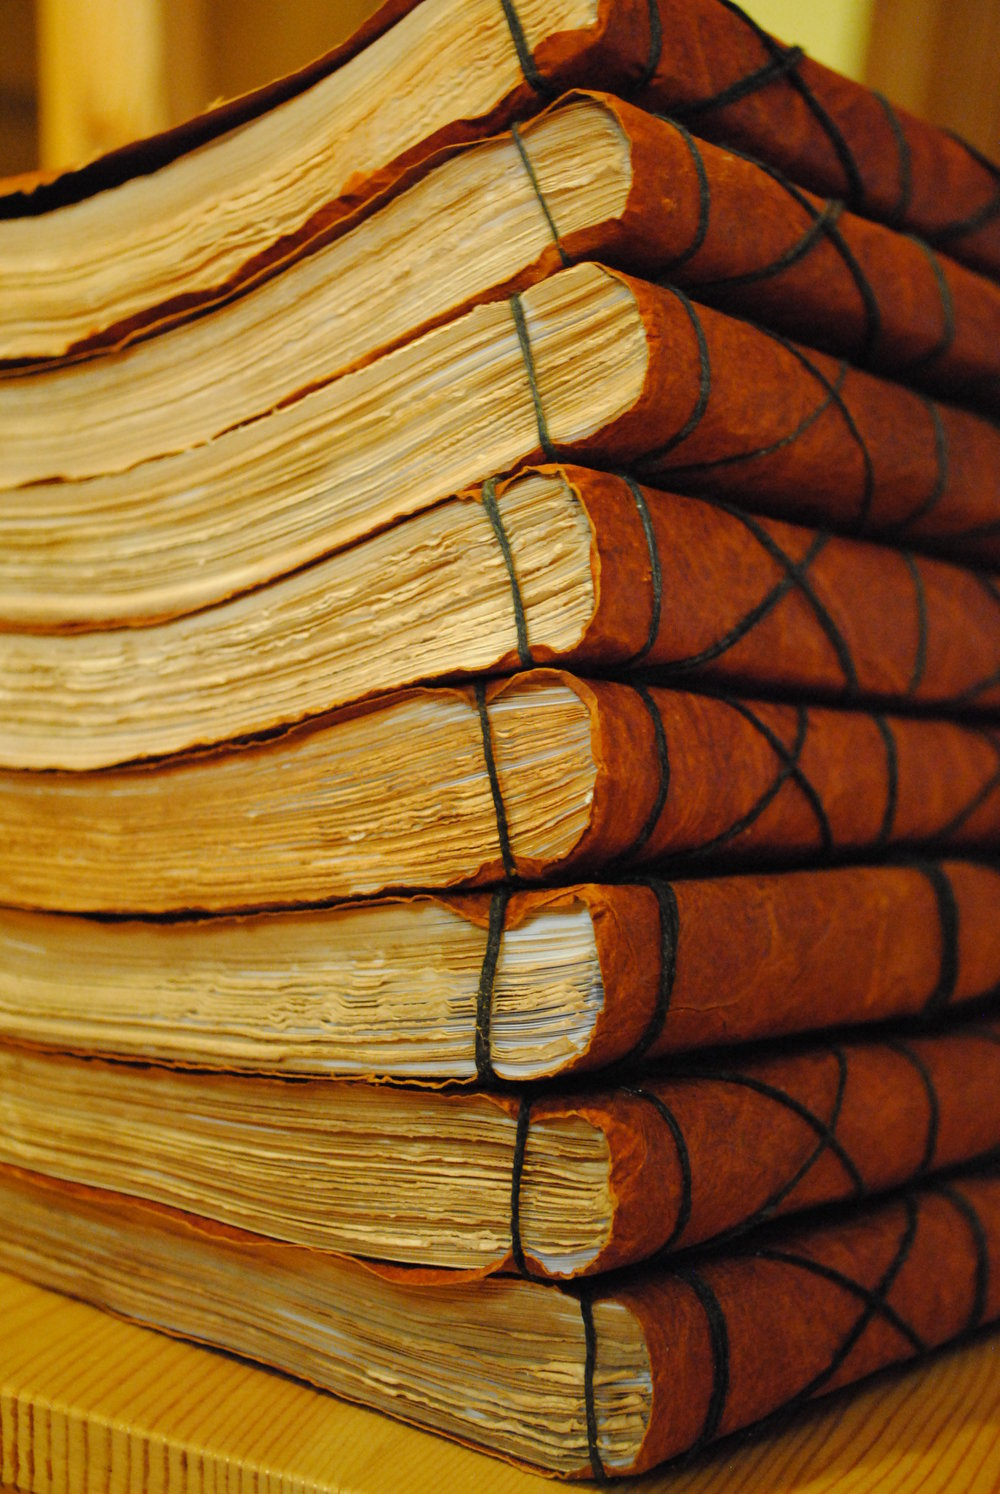 book spines 010.JPG